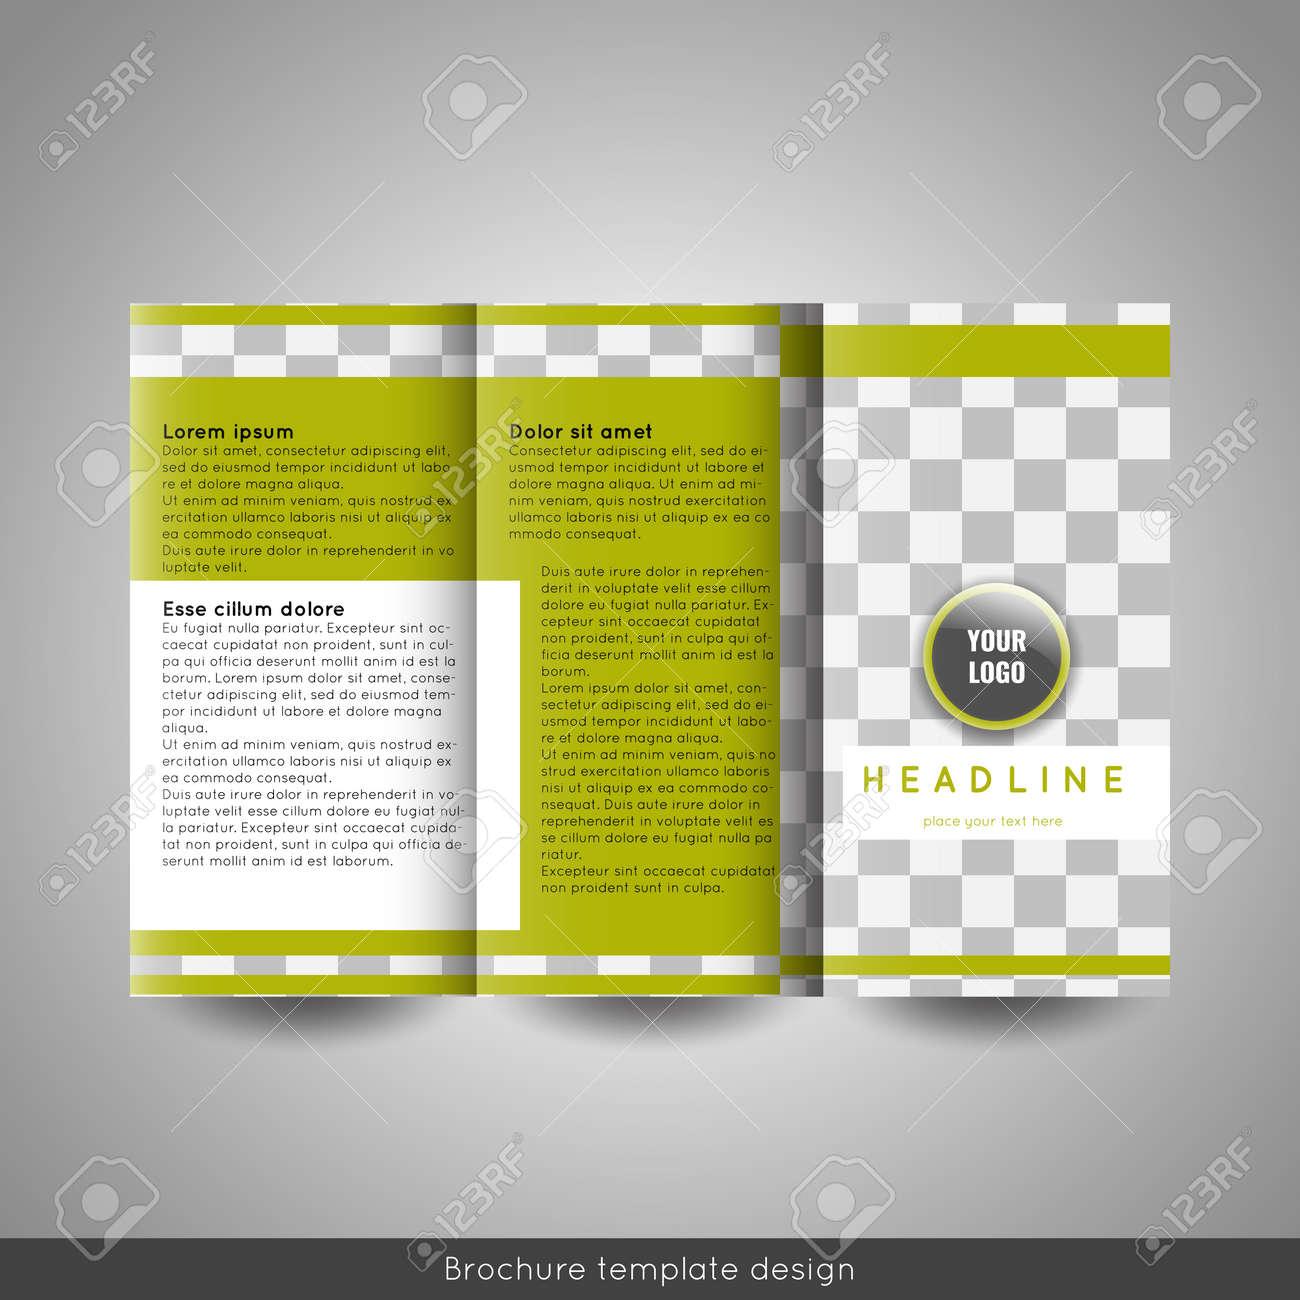 corporate tri fold brochure template design annual report presentation book cover or